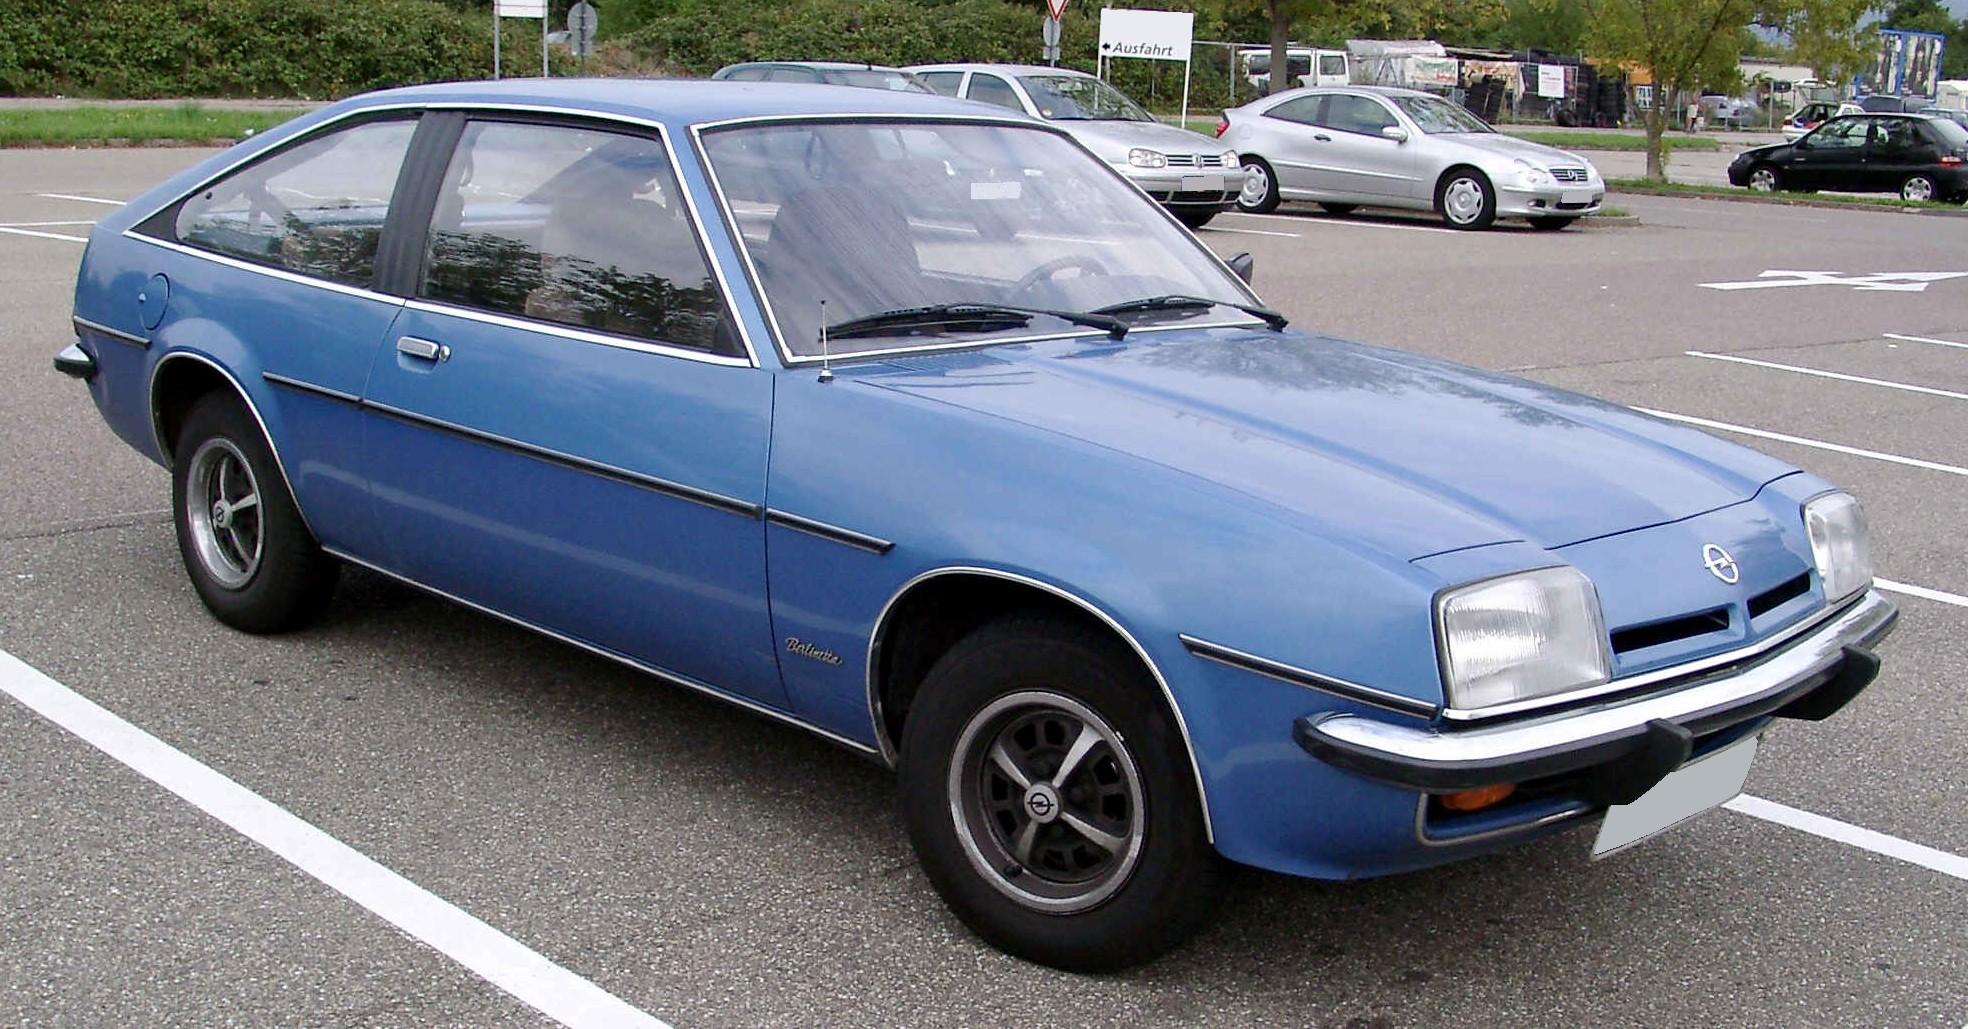 Opel Manta B 1975 - 1988 Coupe #1